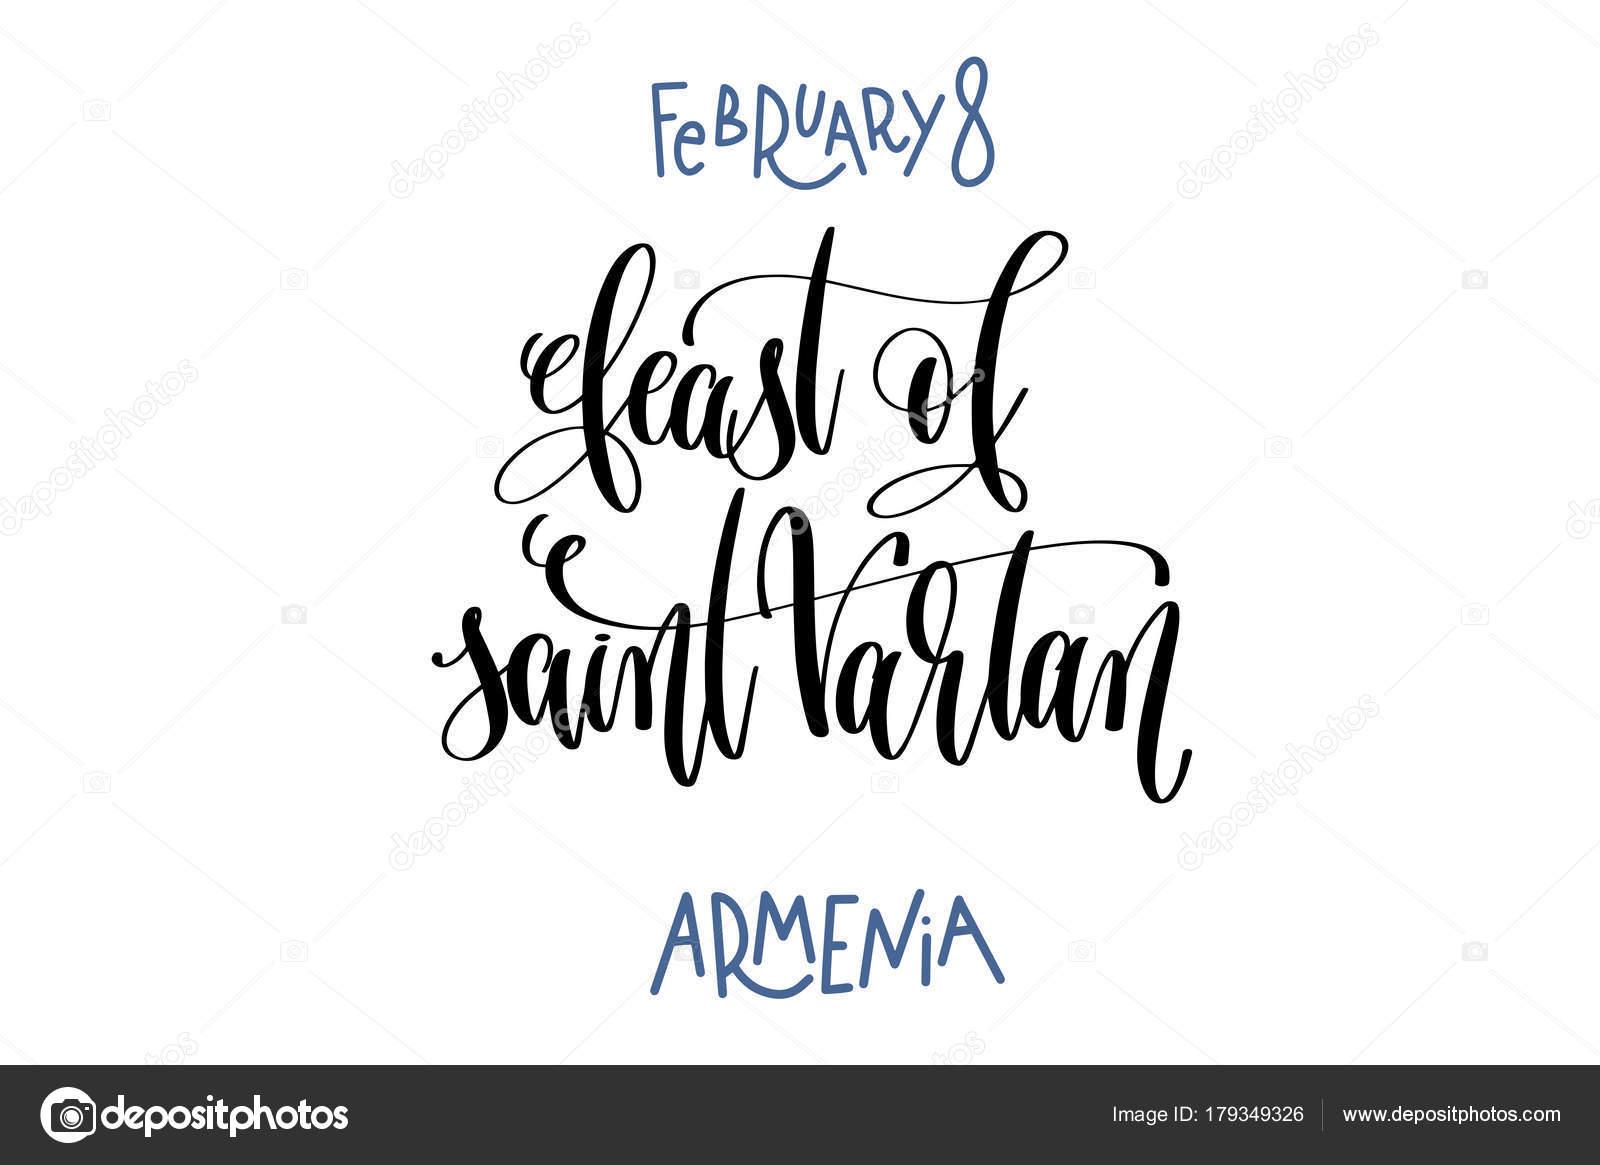 fiesta 8 de febrero